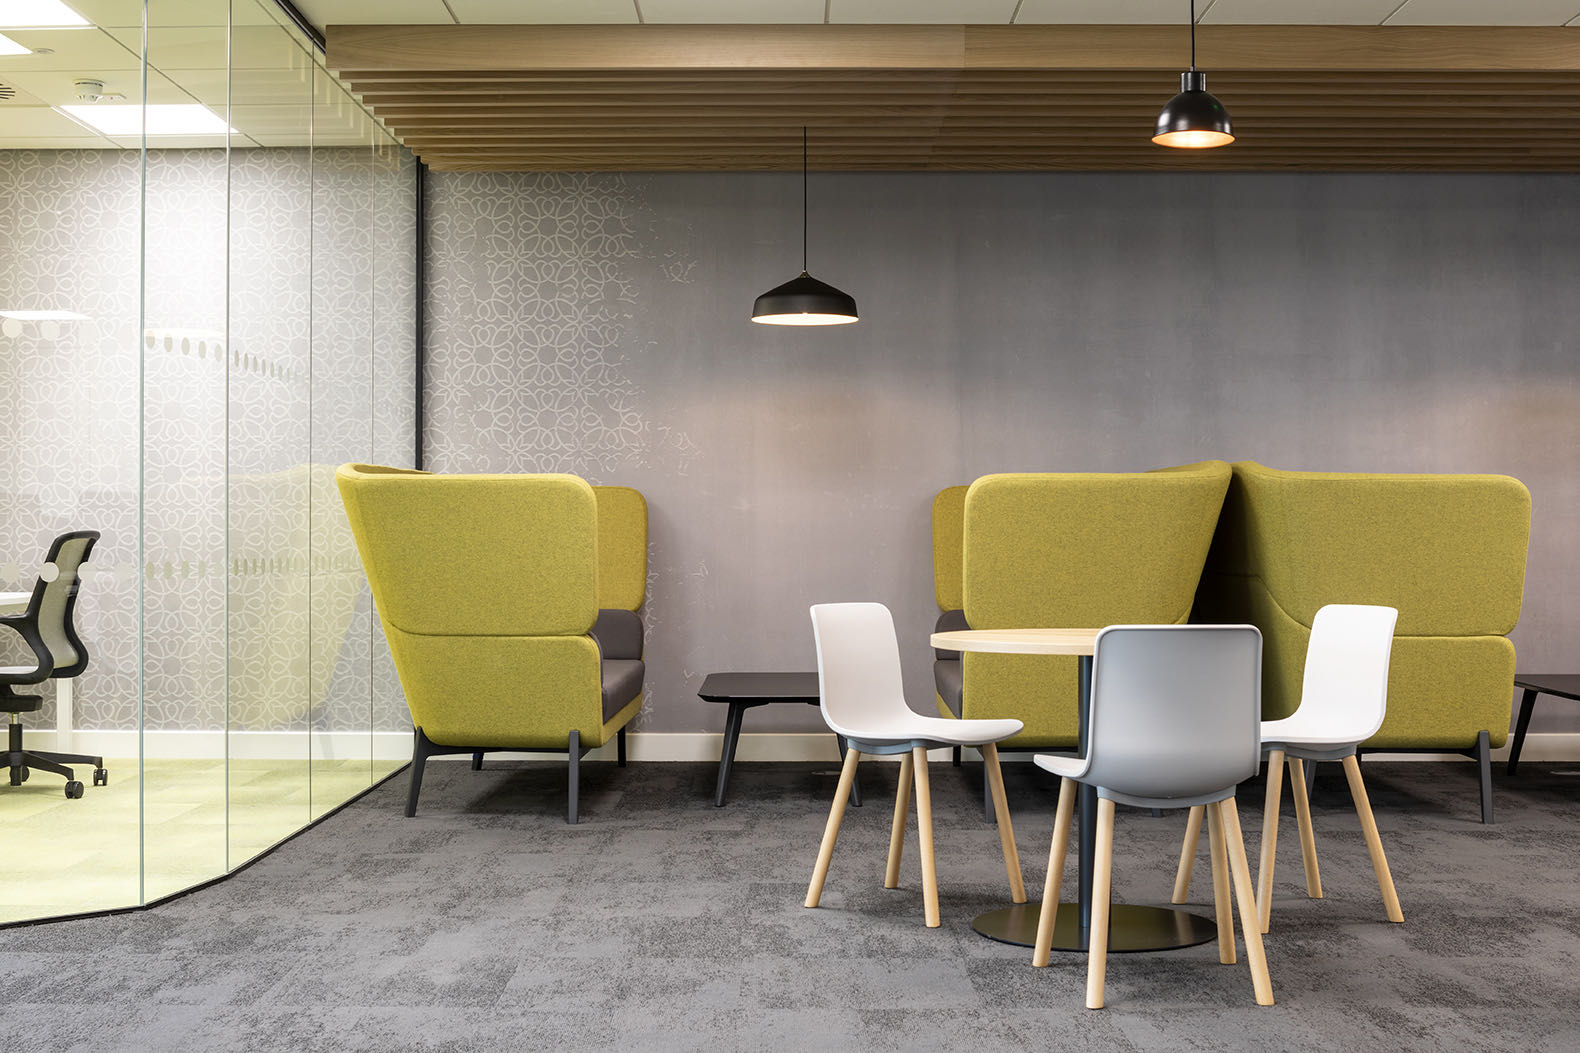 buhler-london-office-16